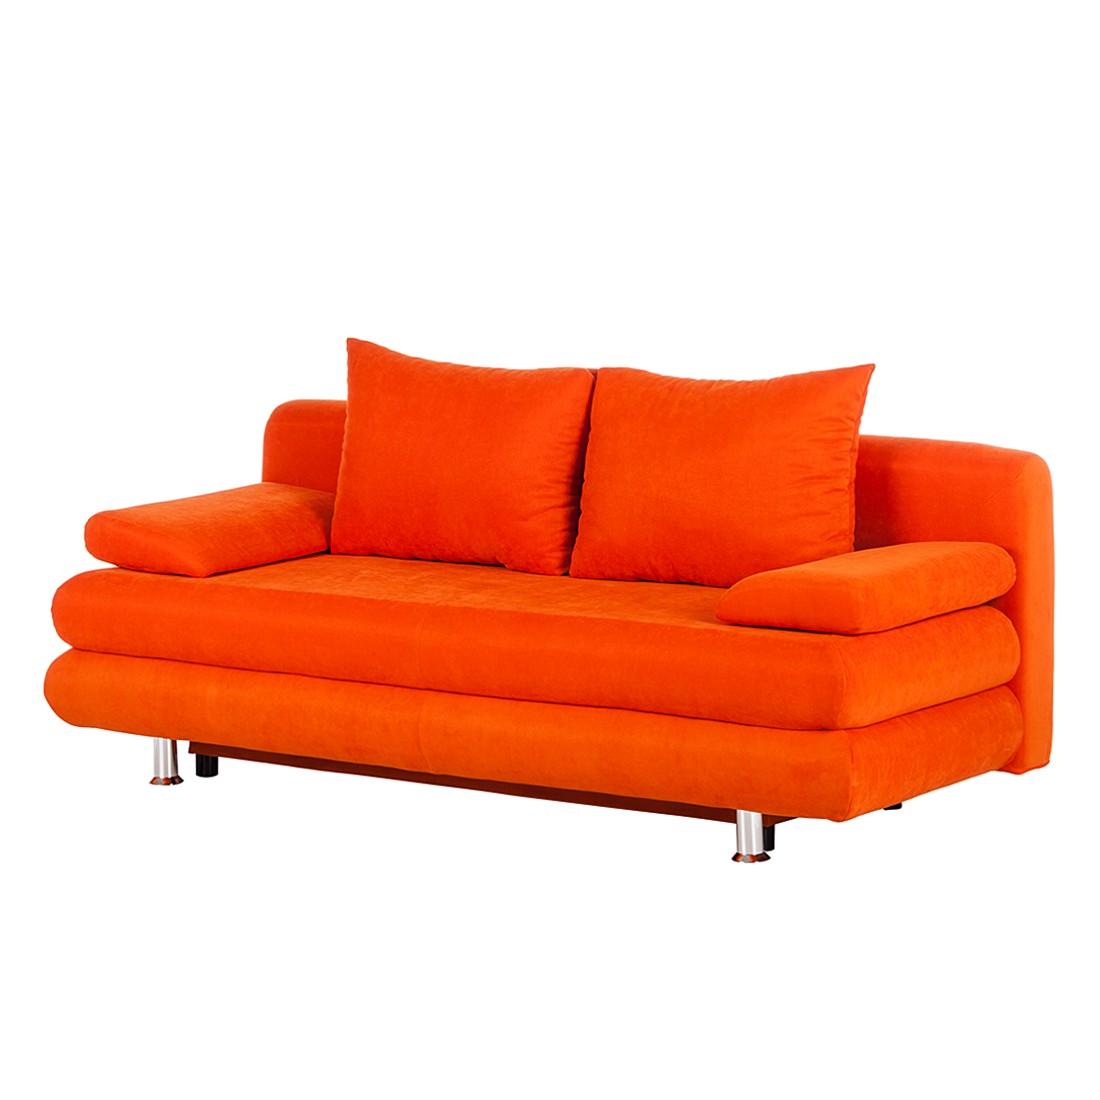 Canap convertible dorothy tissu orange - Canape convertible prix usine ...